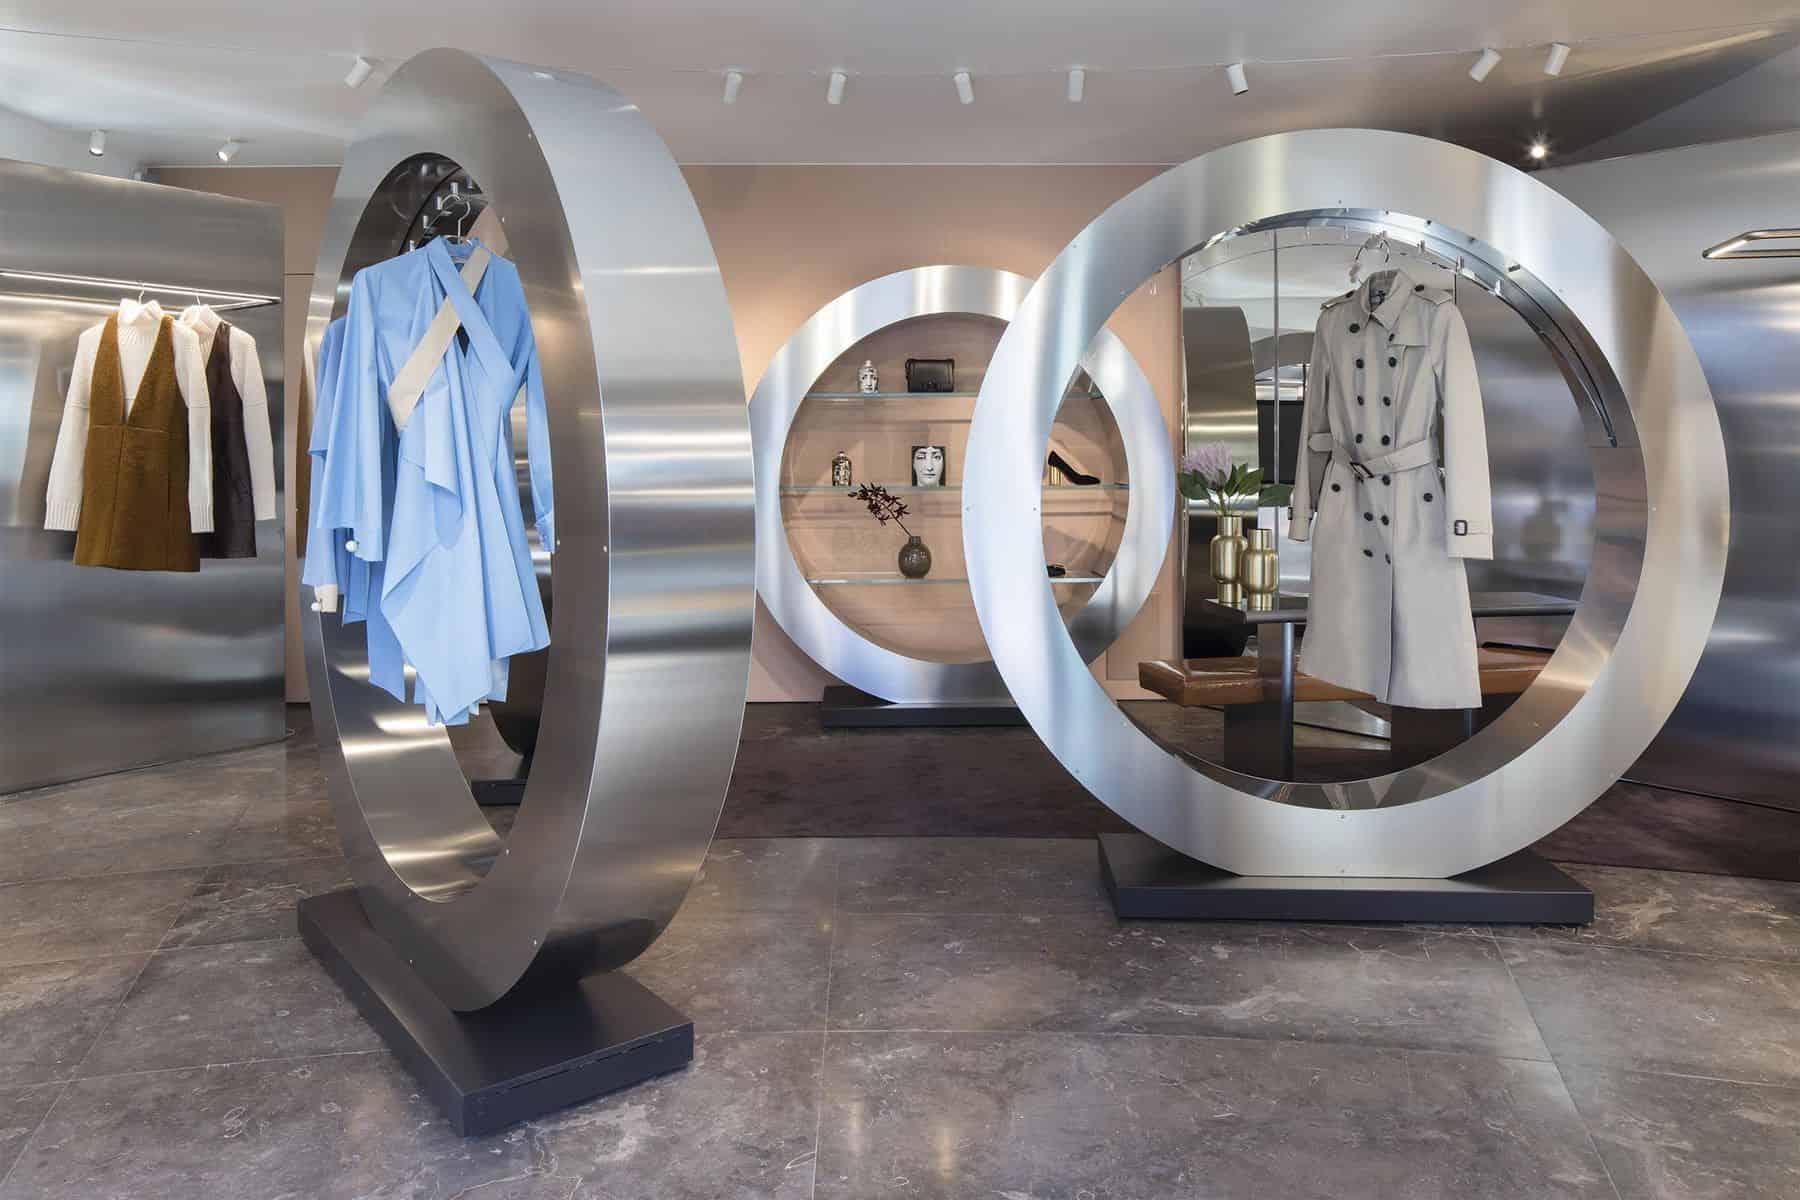 Modes Collaborations Take Men's Fashion To The Next Level